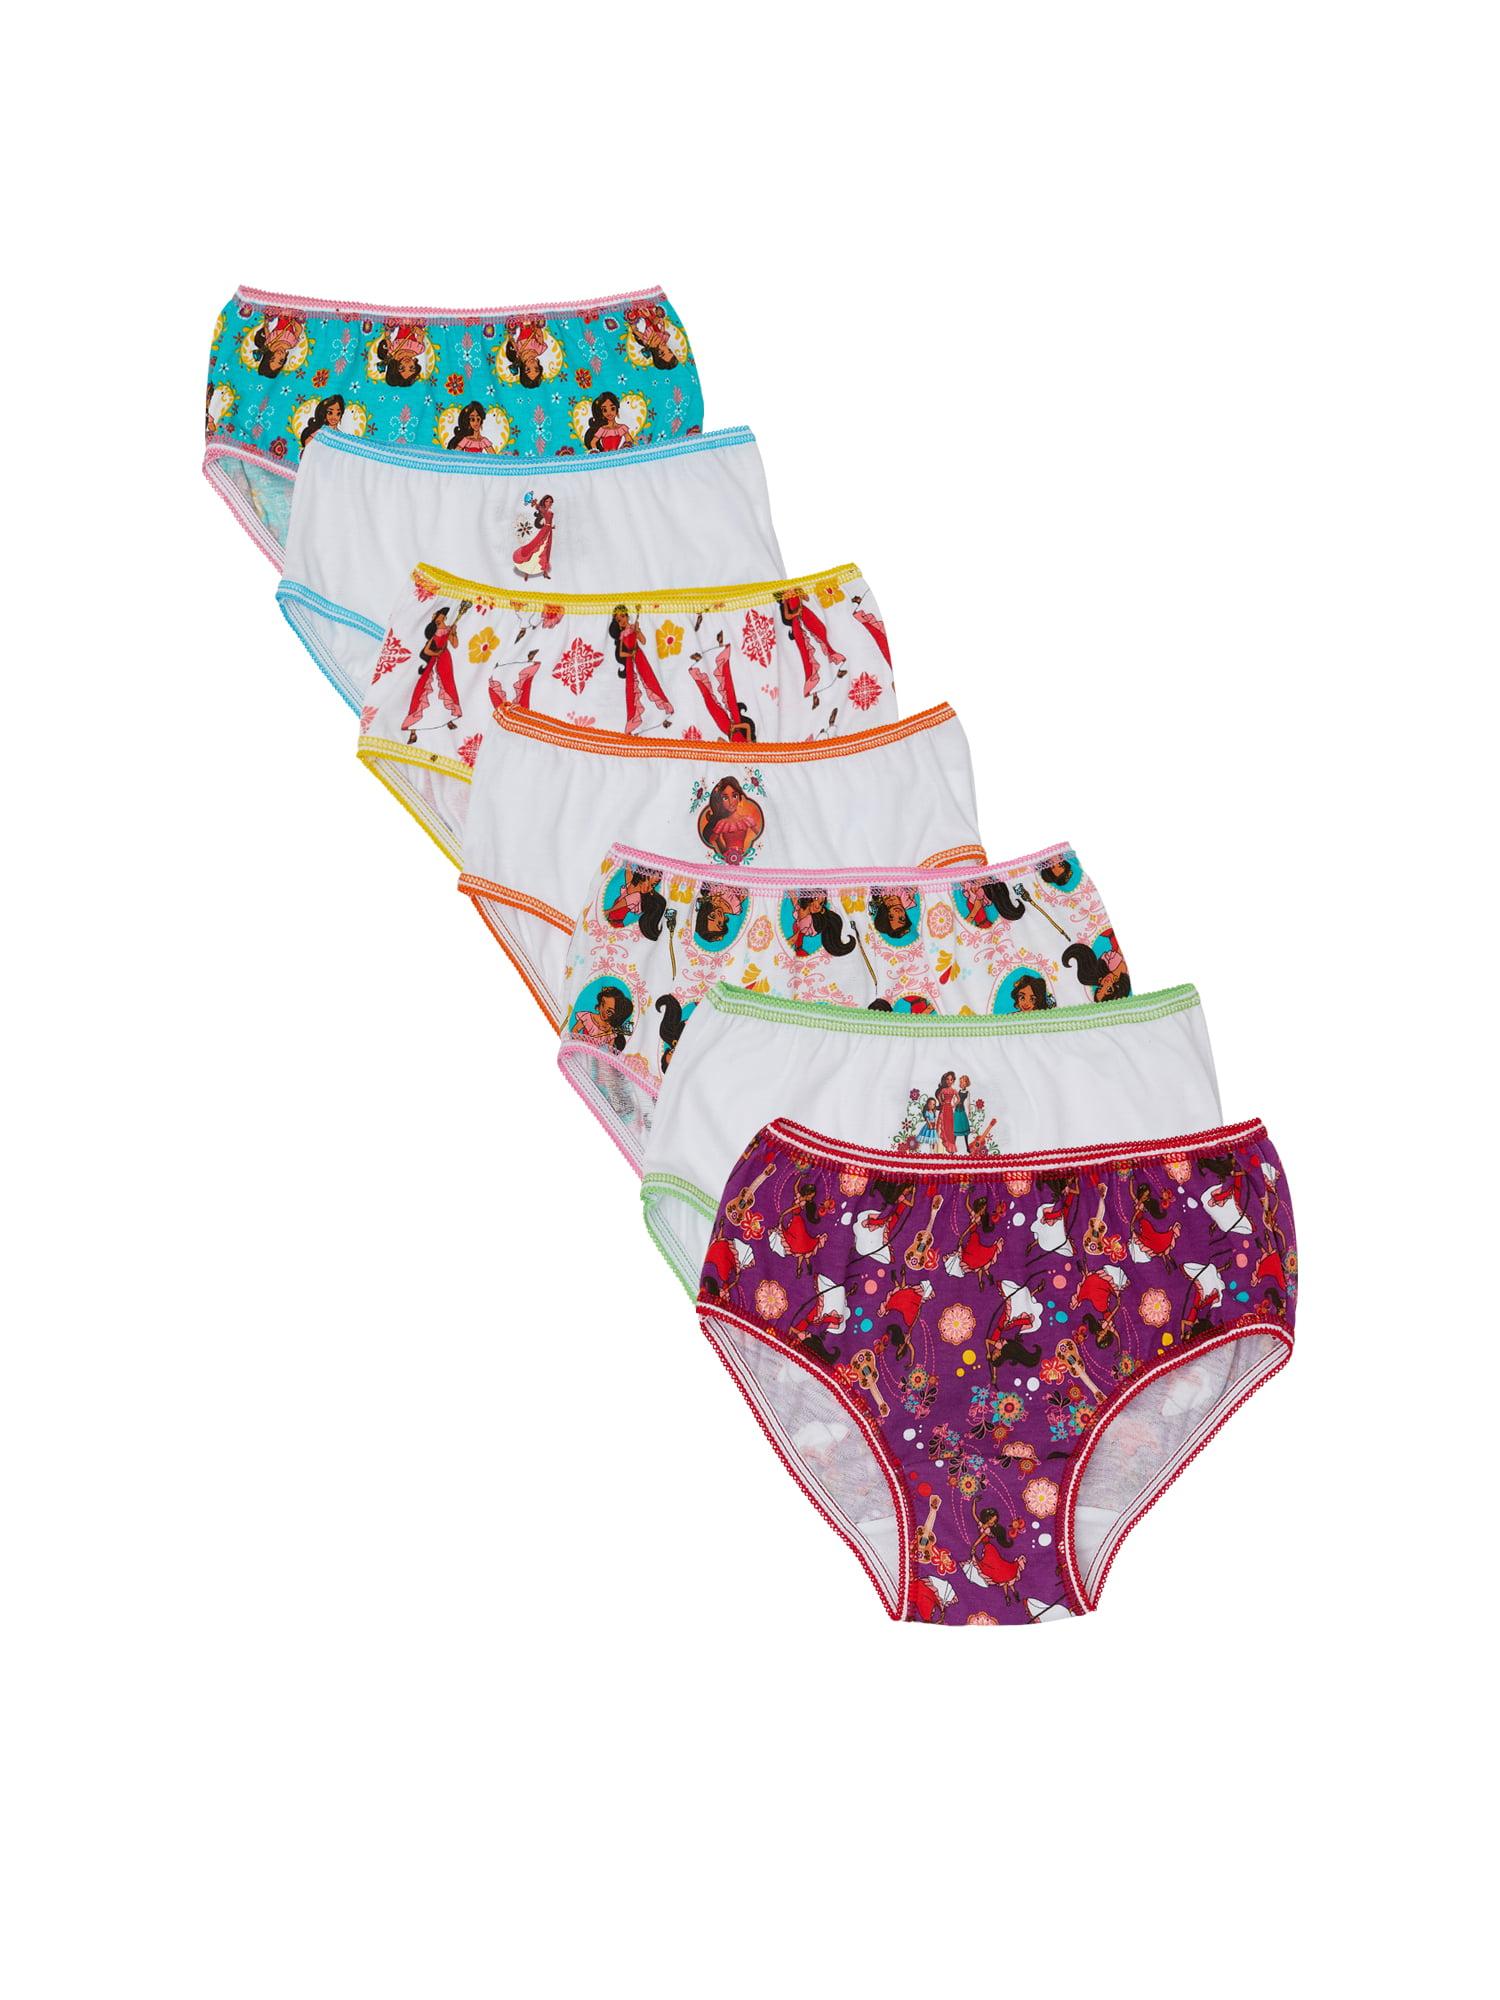 Disney Elena Of Avalor, Girls Underwear, 7 Pack Panties (Little Girls & Big Girls)